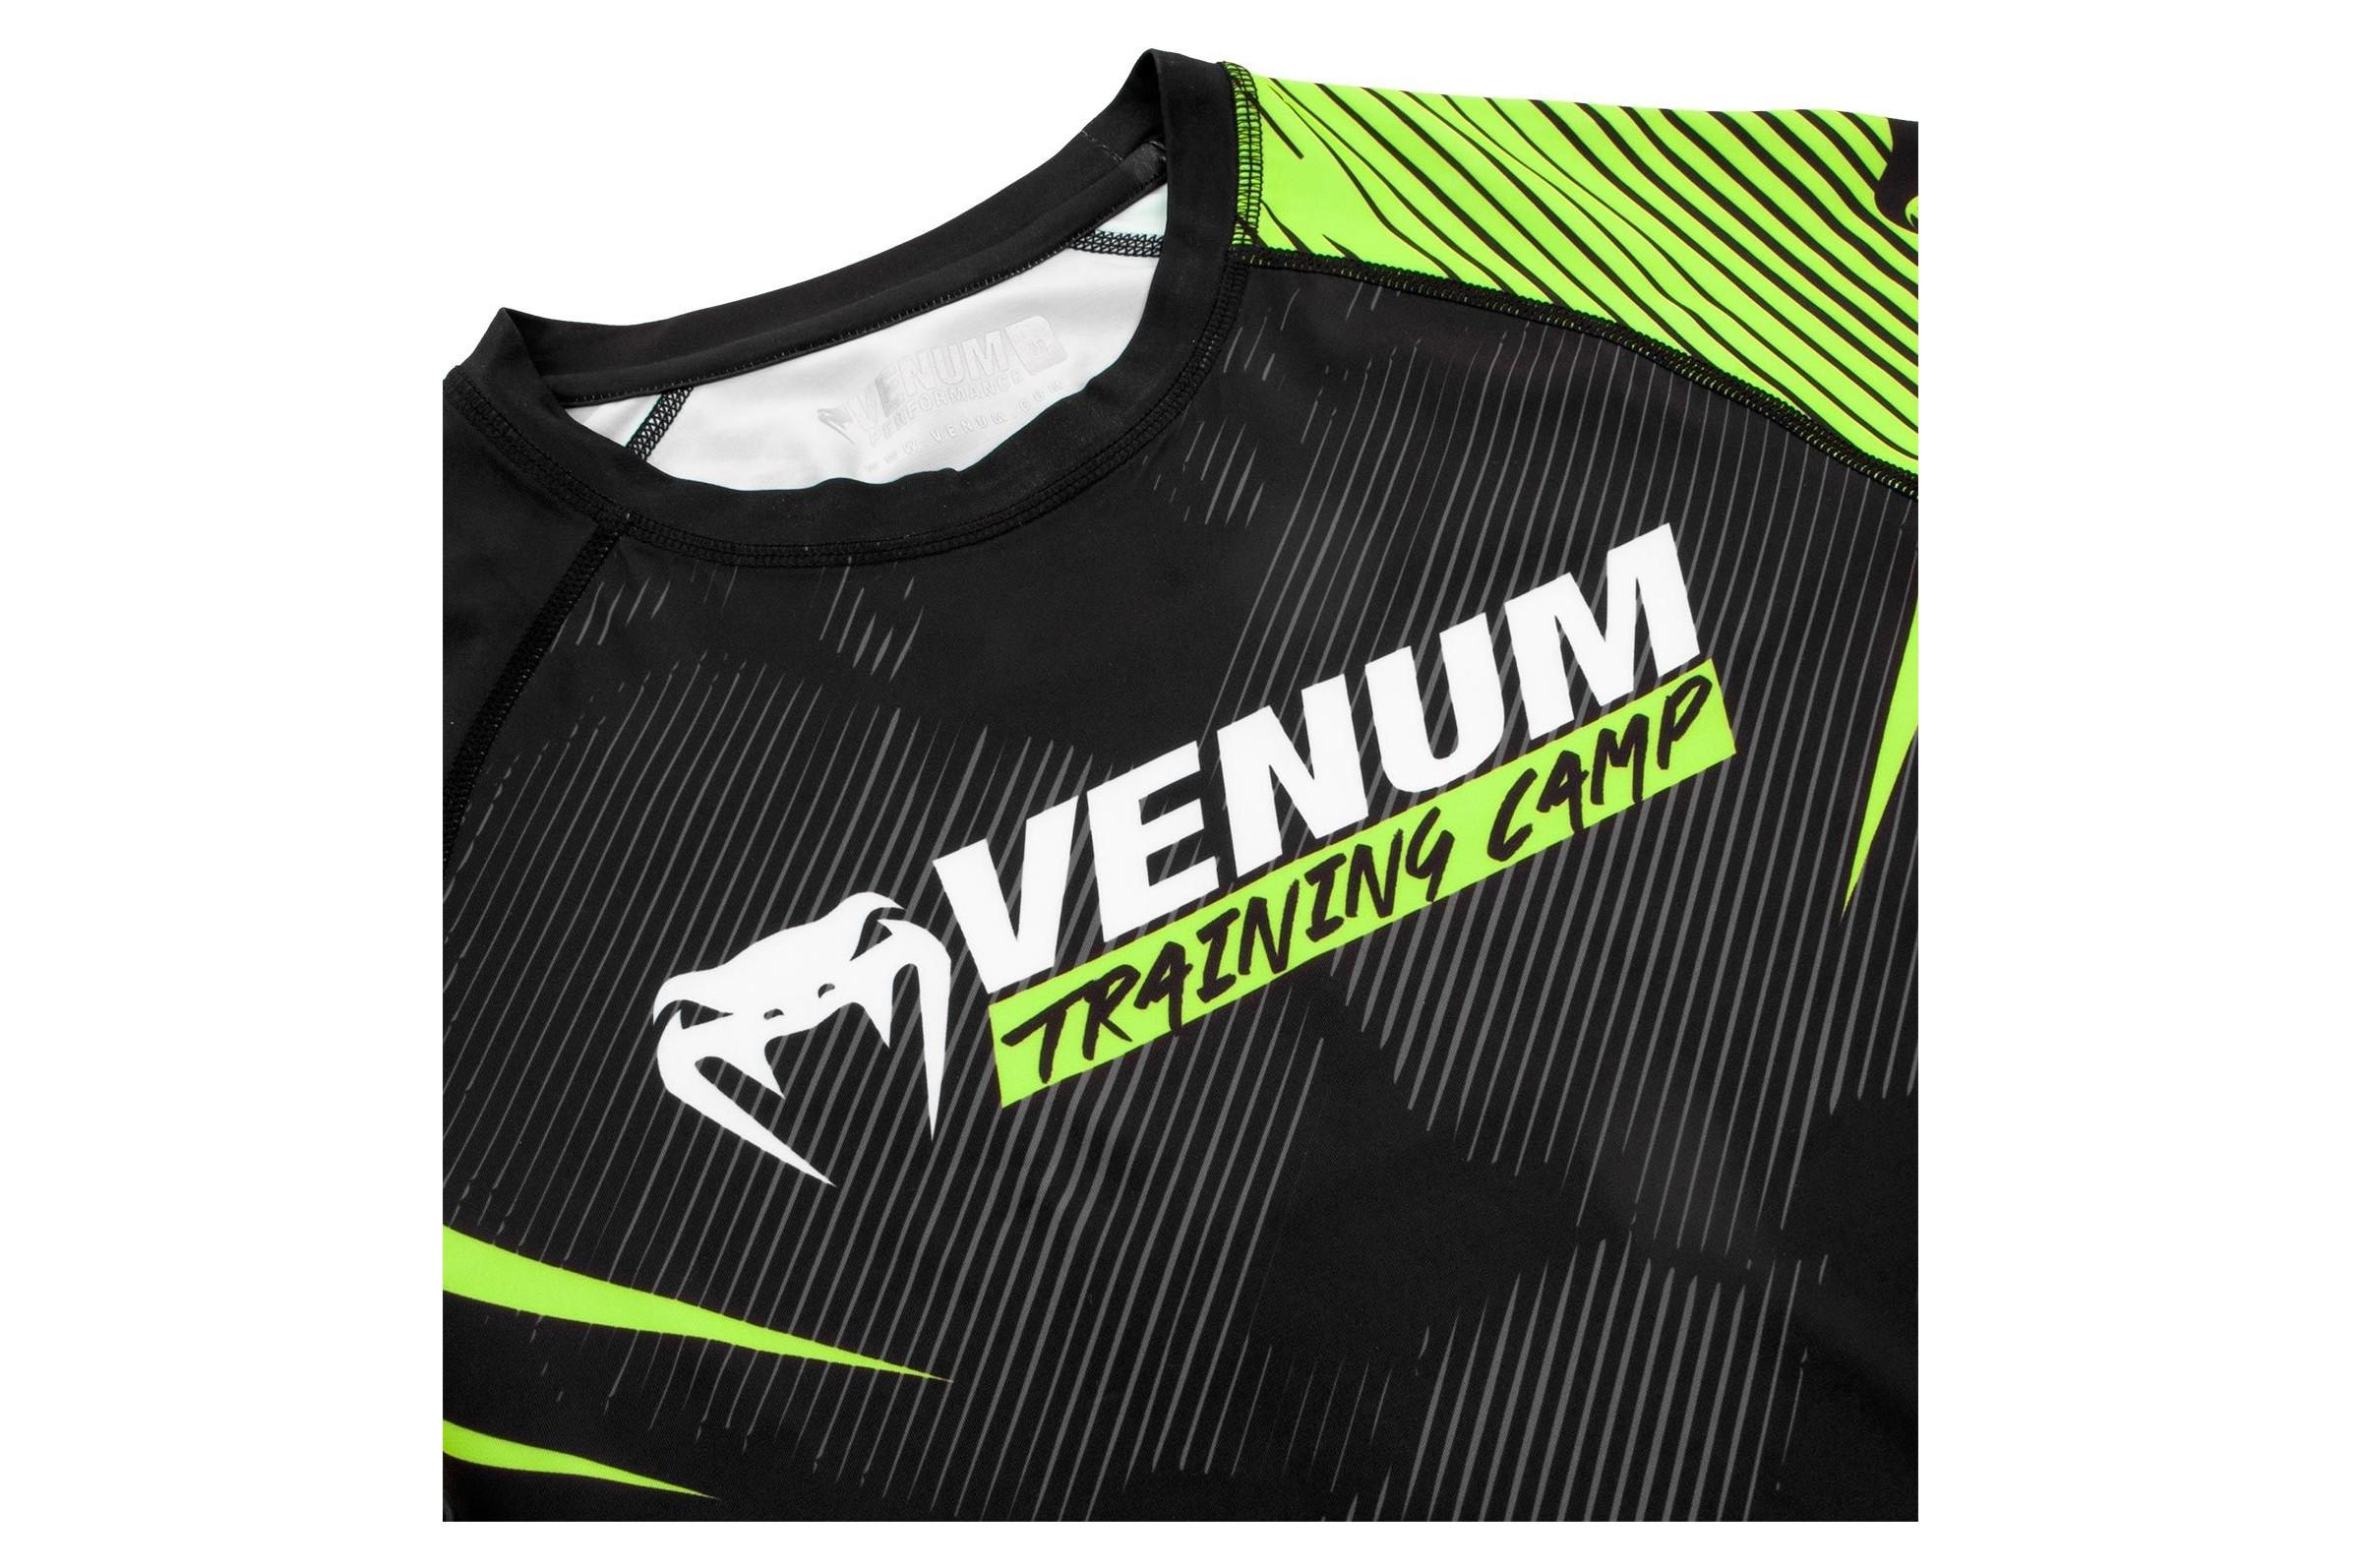 Venum Training Camp 2.0 Rashguard-Manches Courtes Homme